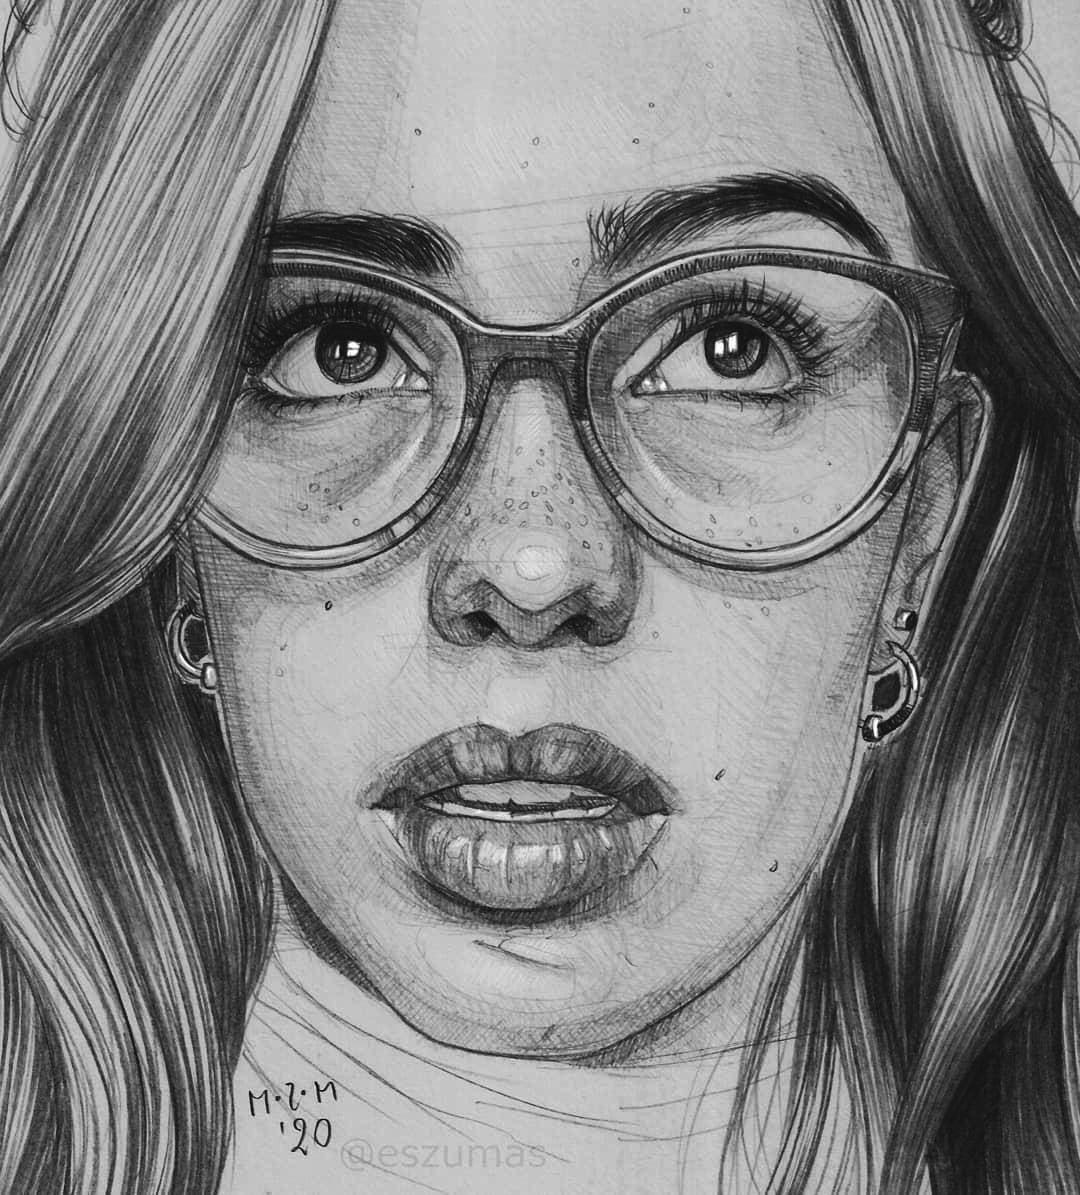 portrait pencil drawing helena beckman